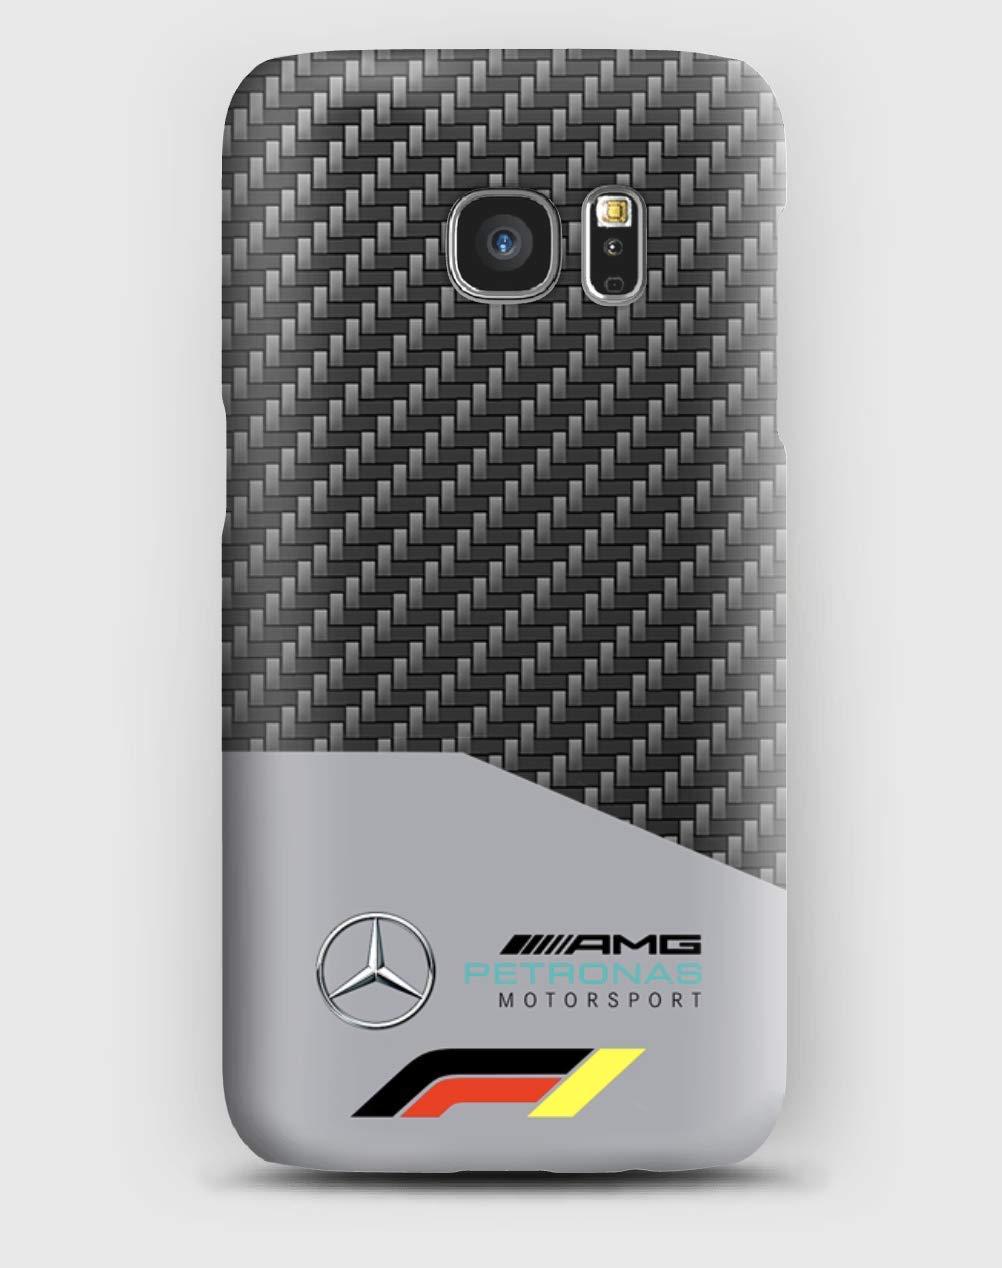 F1 Mercedes Funda para el Samsung S6, S7, S8, S9, A3, A5, A7A8, J3, J5, Note 4,5,8,9,